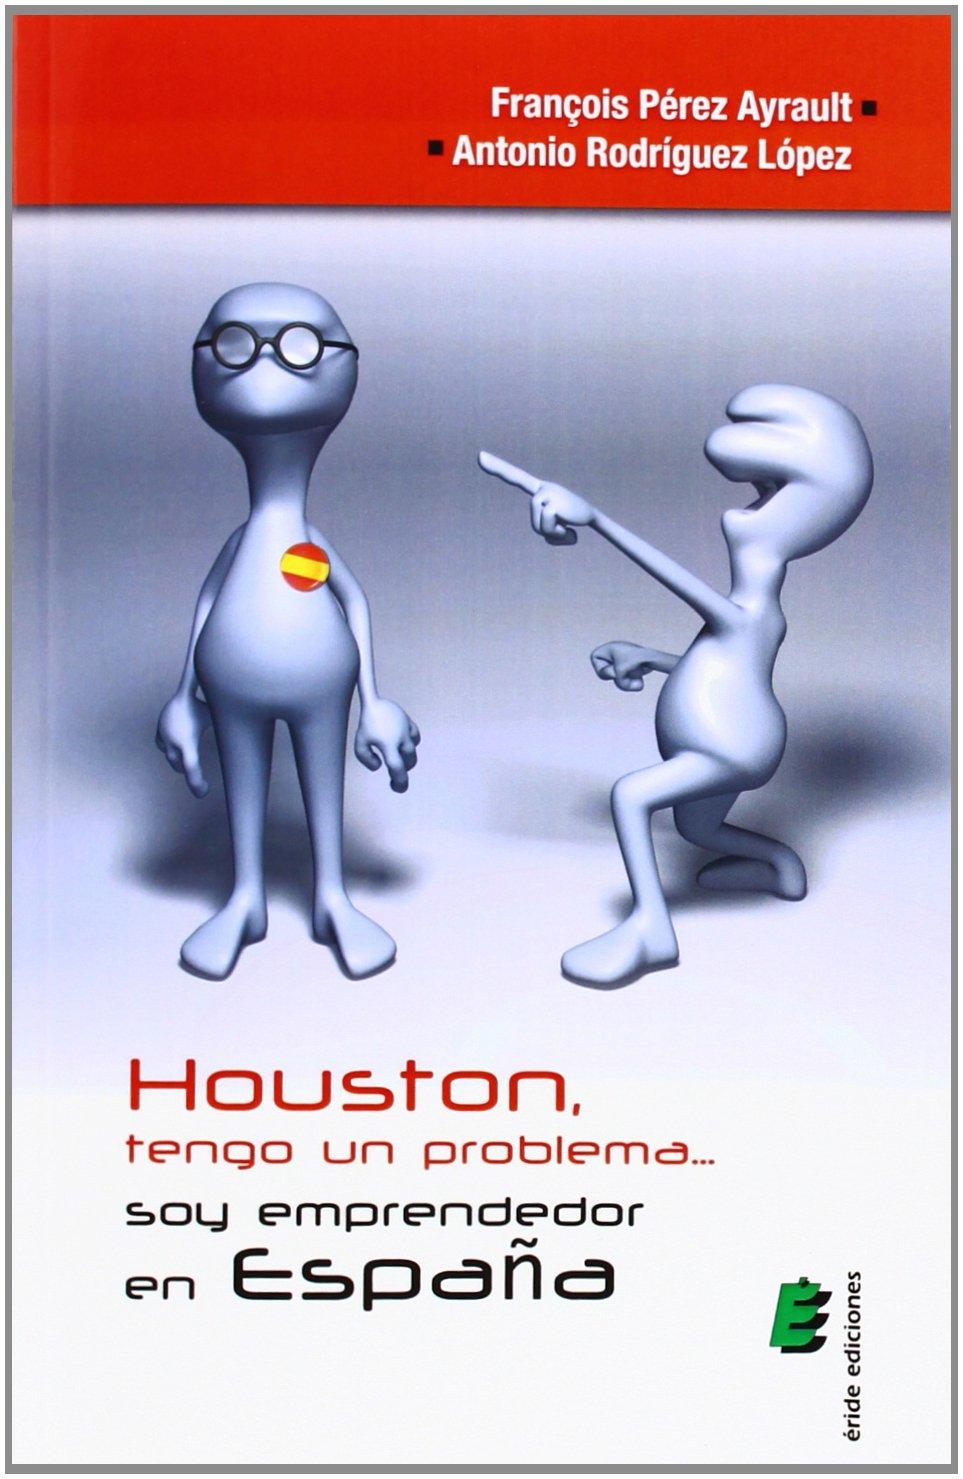 Houston, tengo un problema... soy emprendedor en España: Amazon.es: Pérez Ayrault, Frençois, Rodríguez López, Antonio: Libros